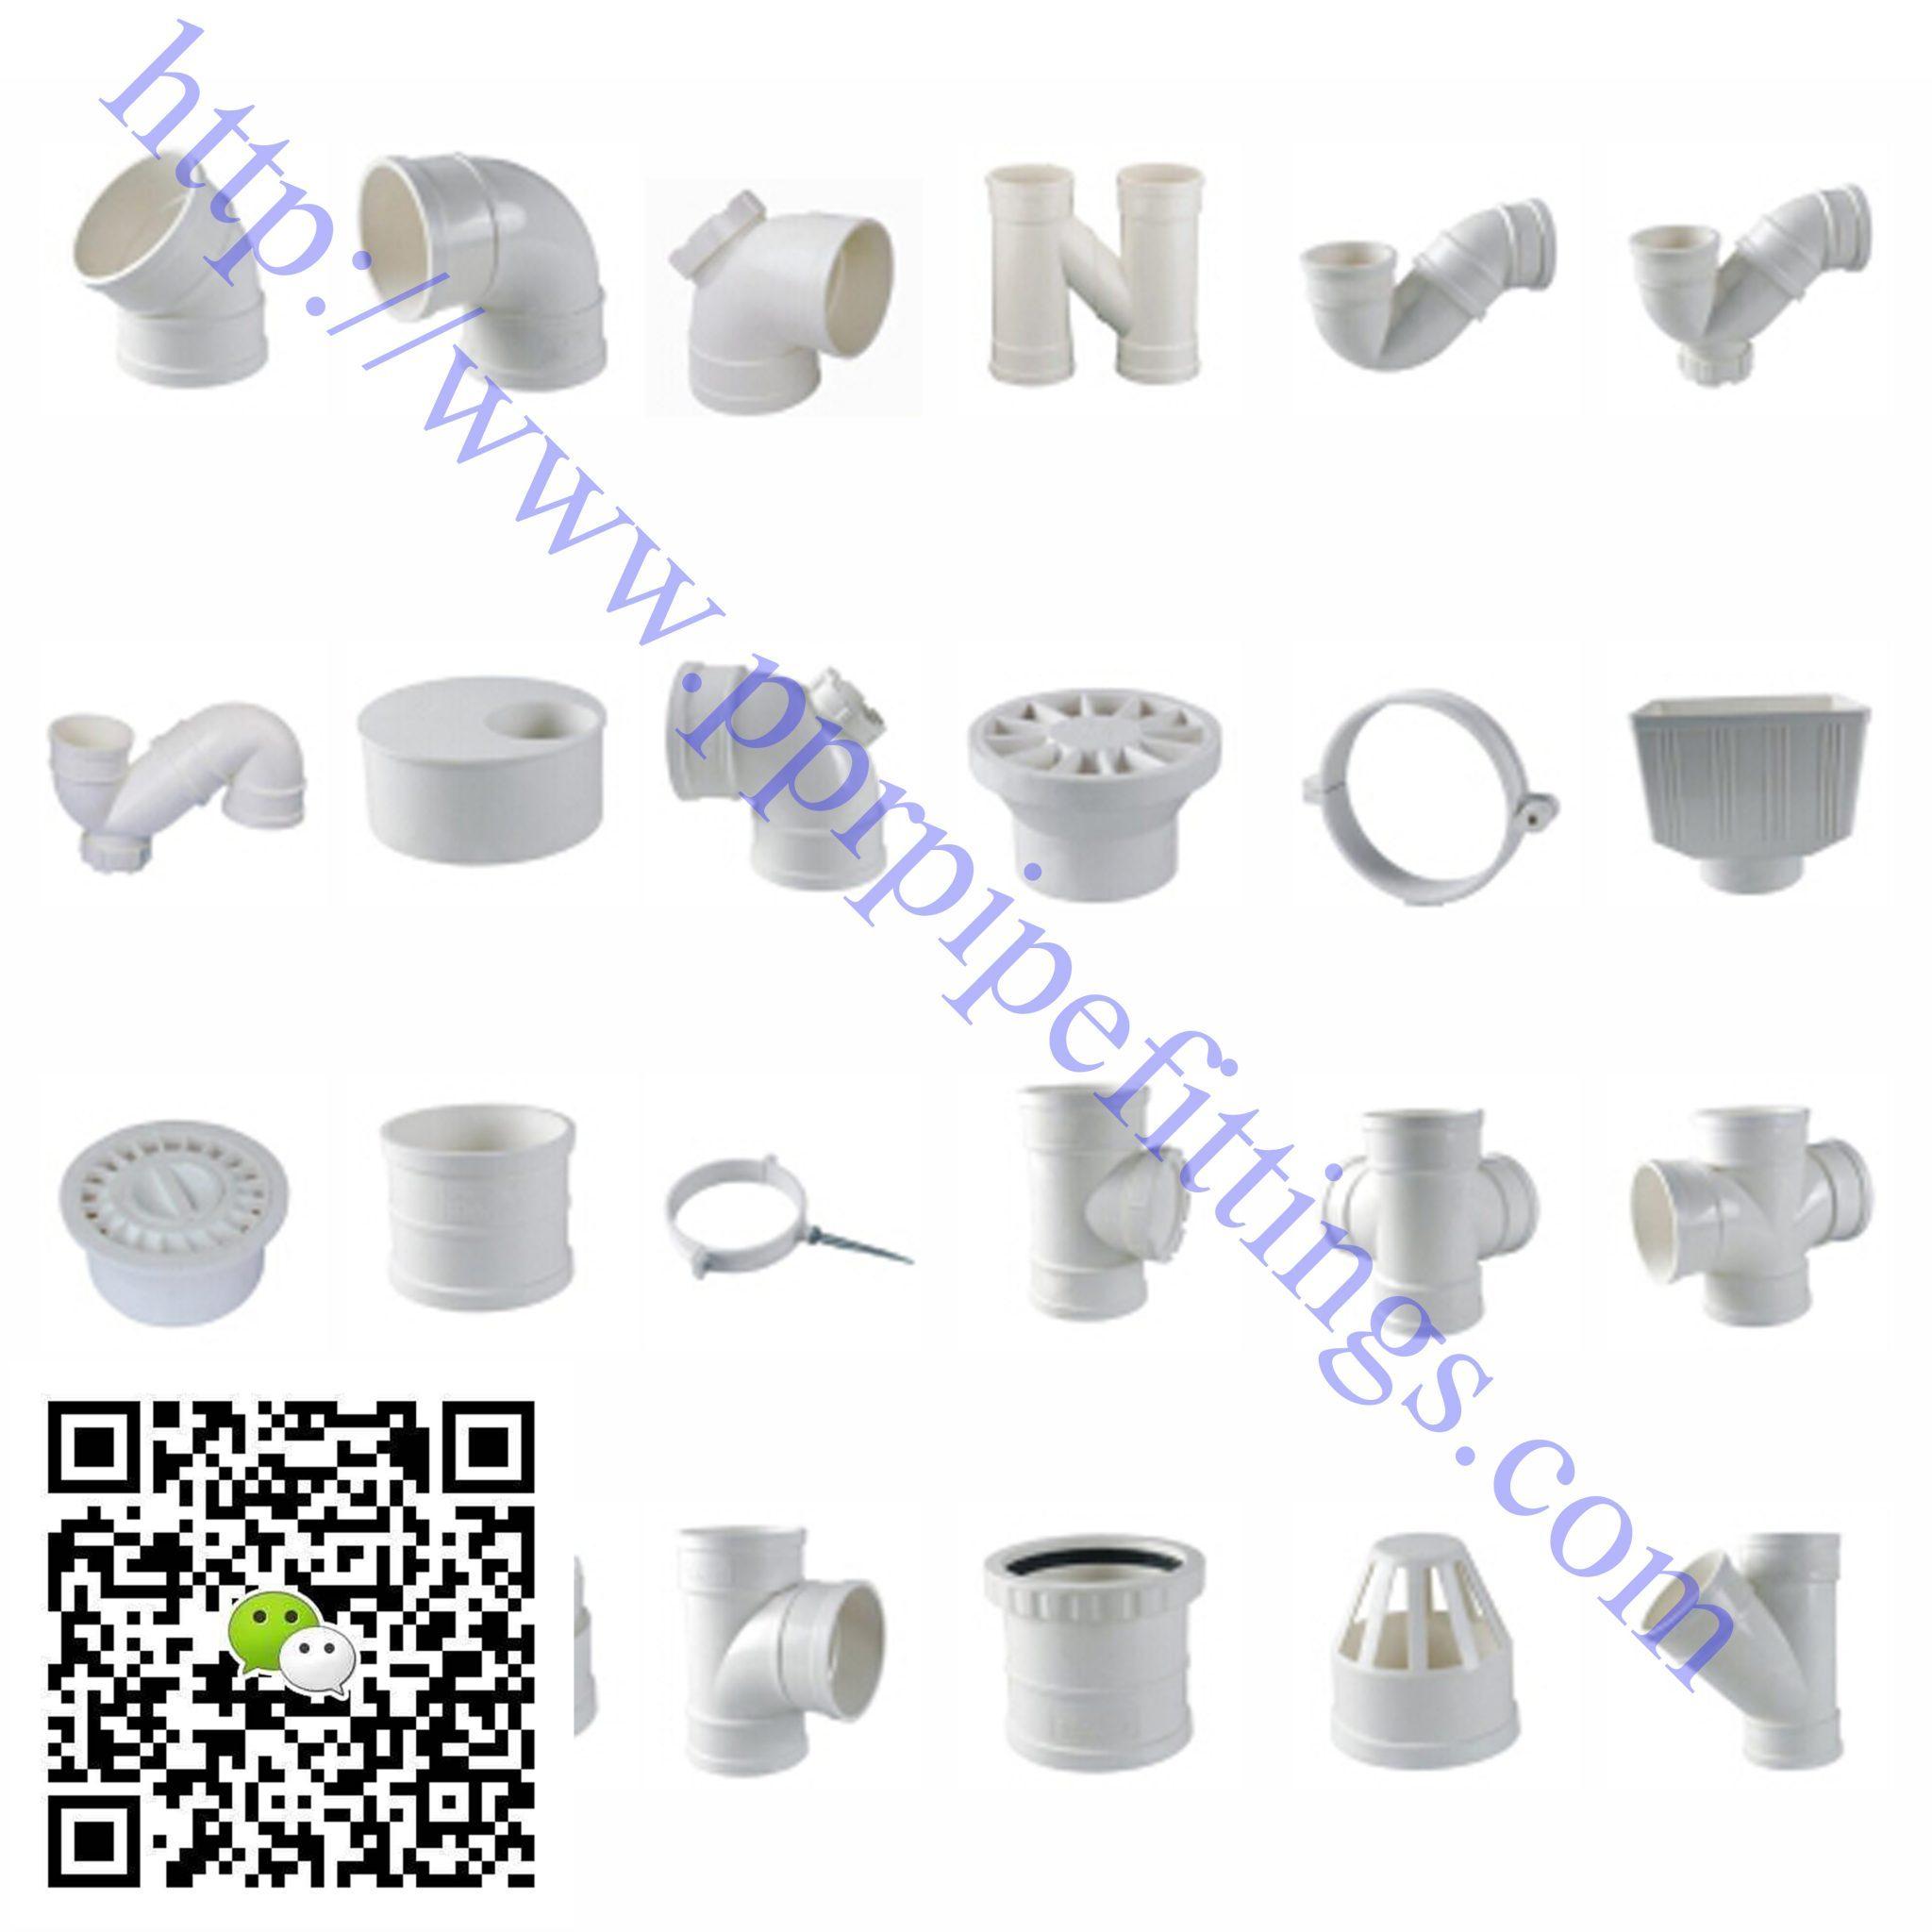 Pvc Pipe Fittings : Pvc pipe fittings